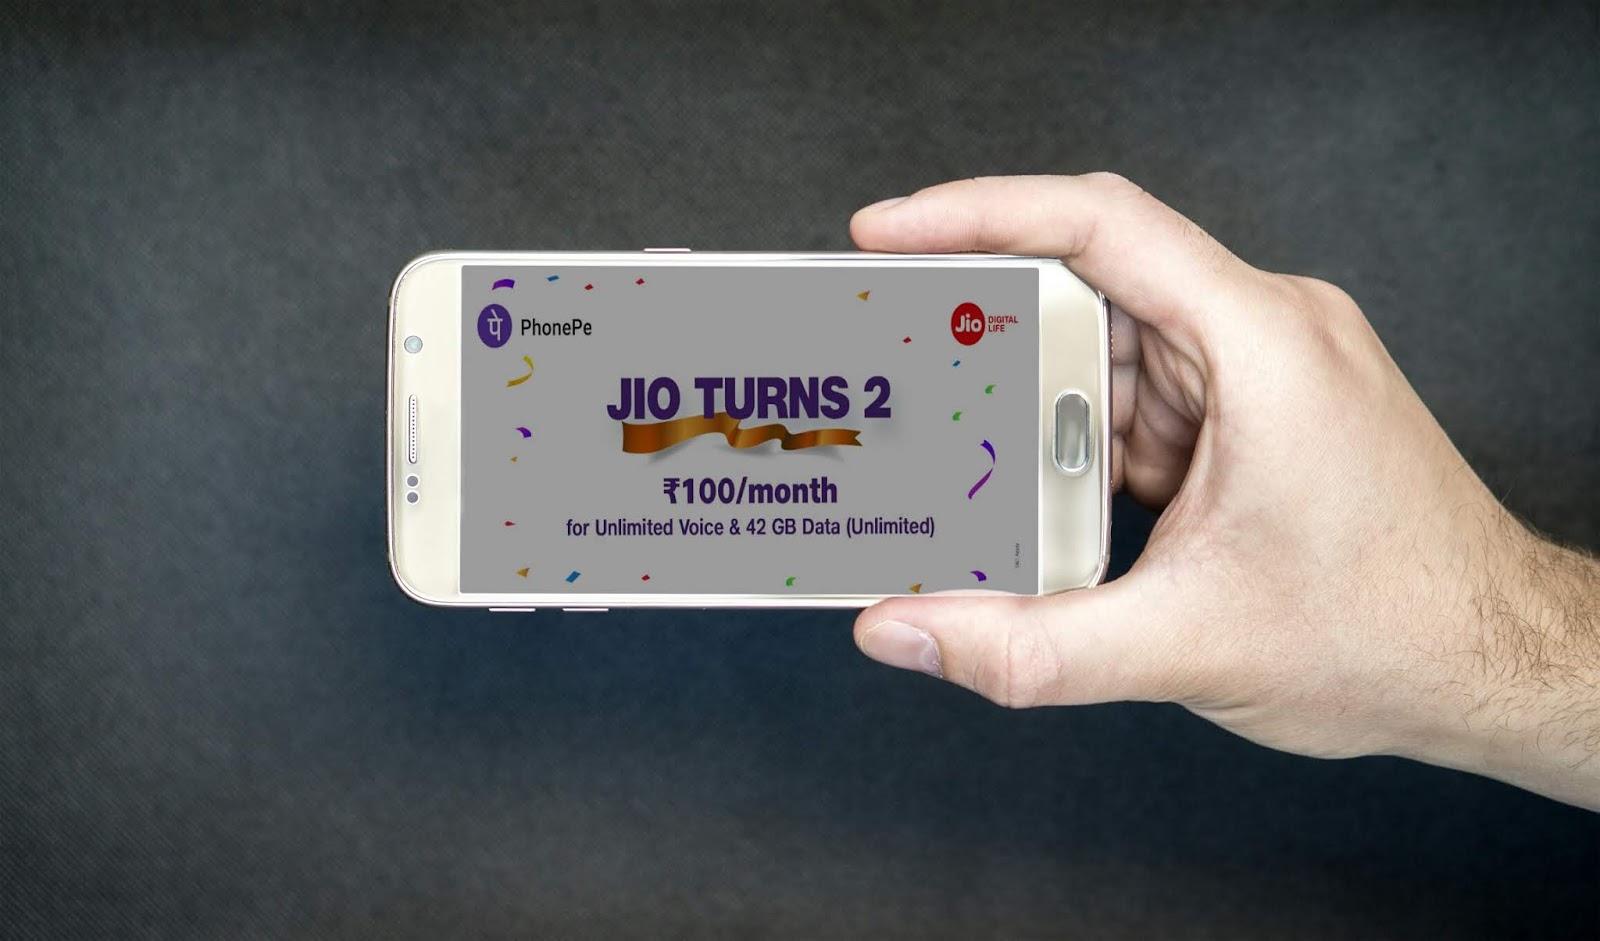 PhonePe App Offers 2019